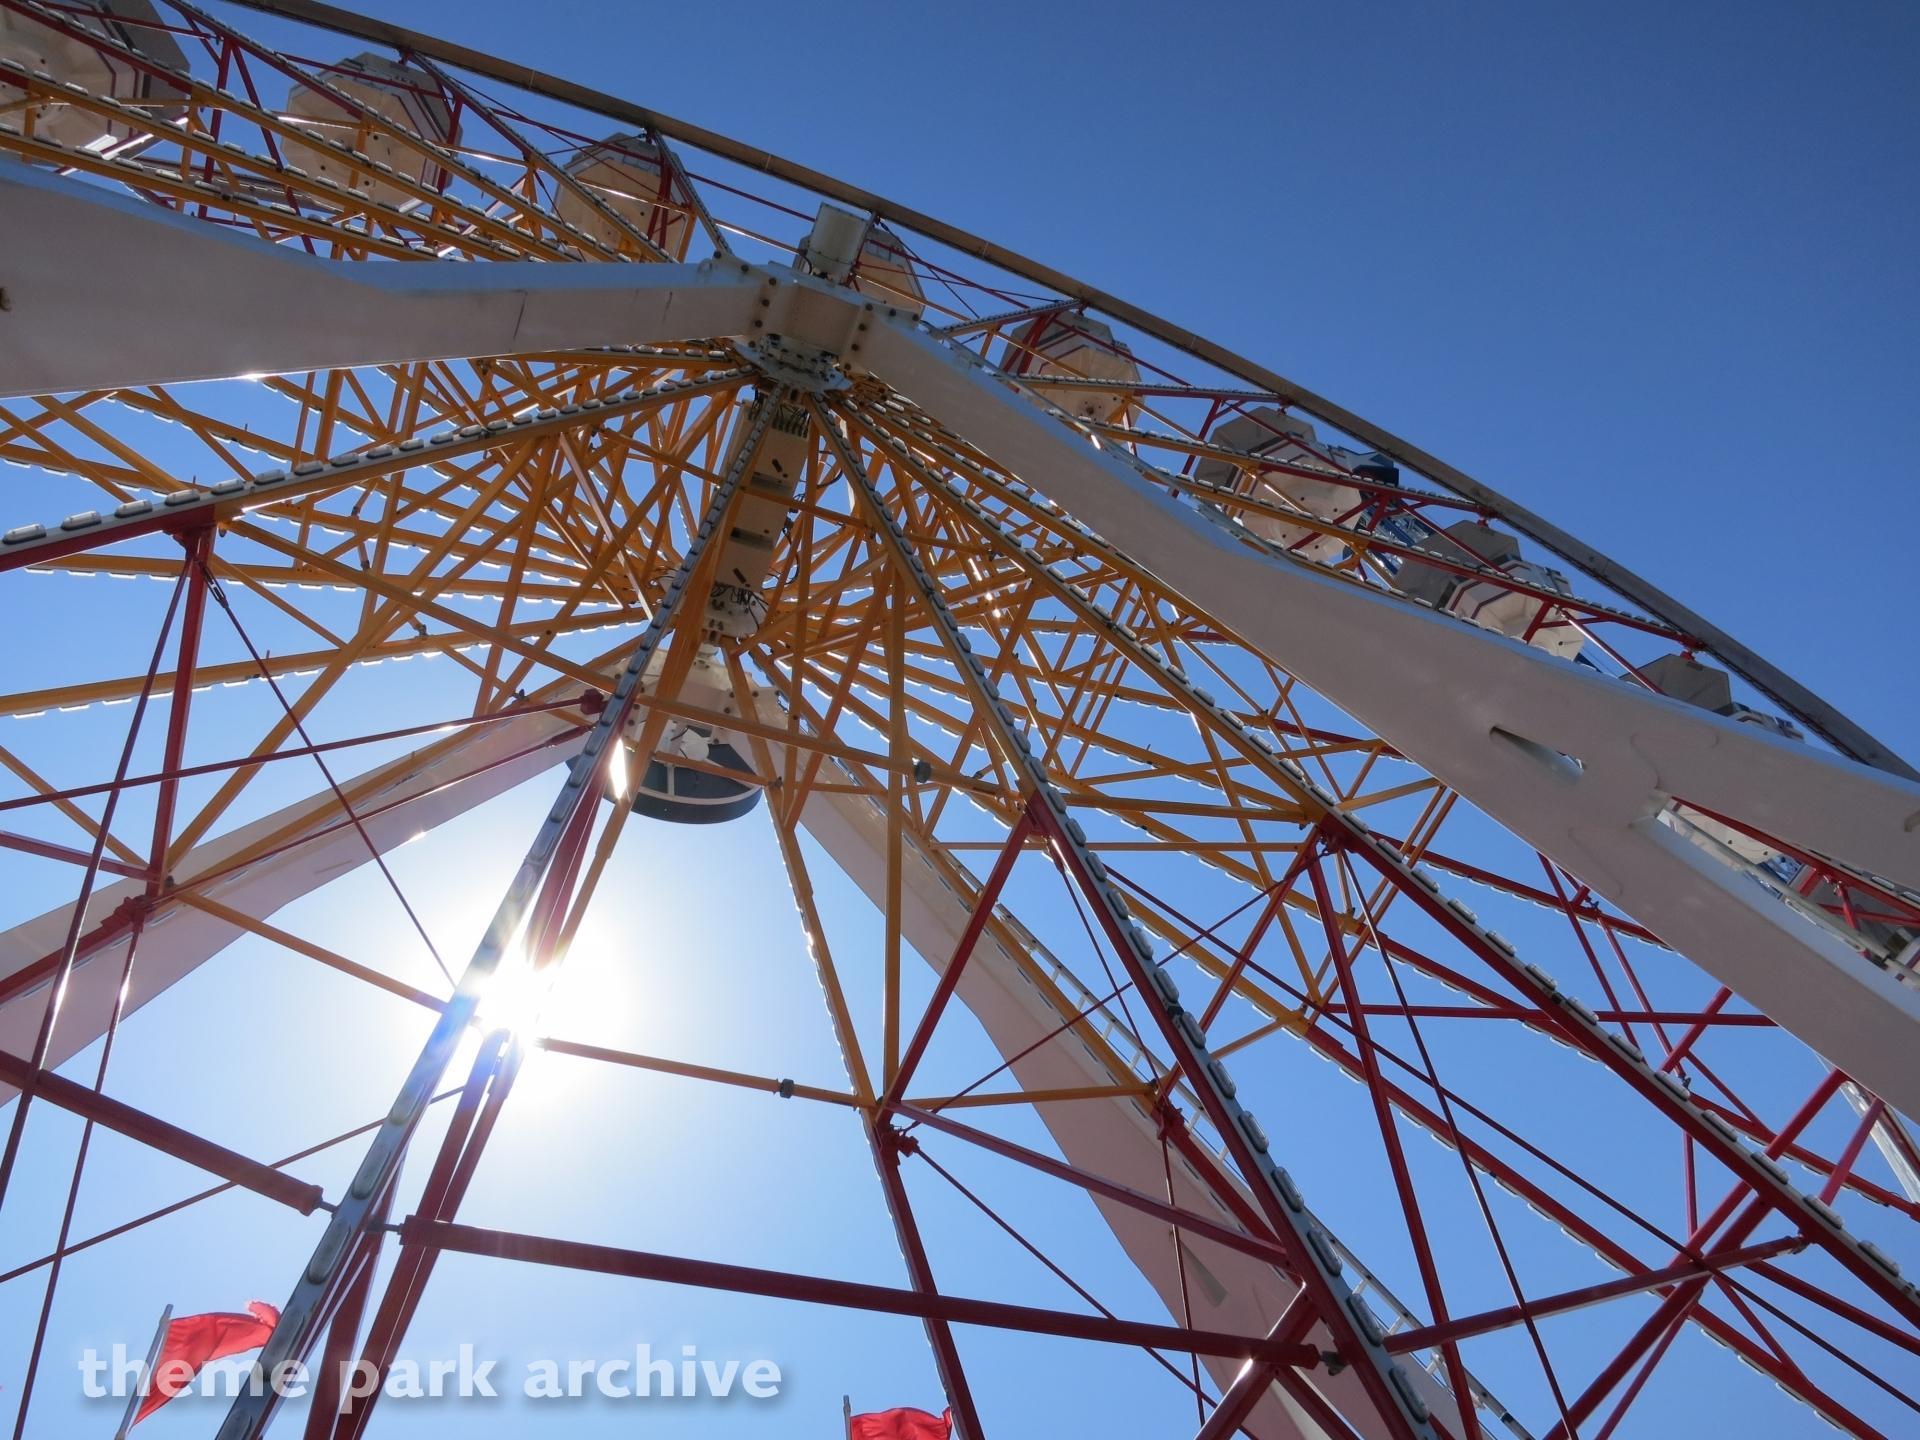 Galaxy Wheel at Galveston Island Historic Pleasure Pier